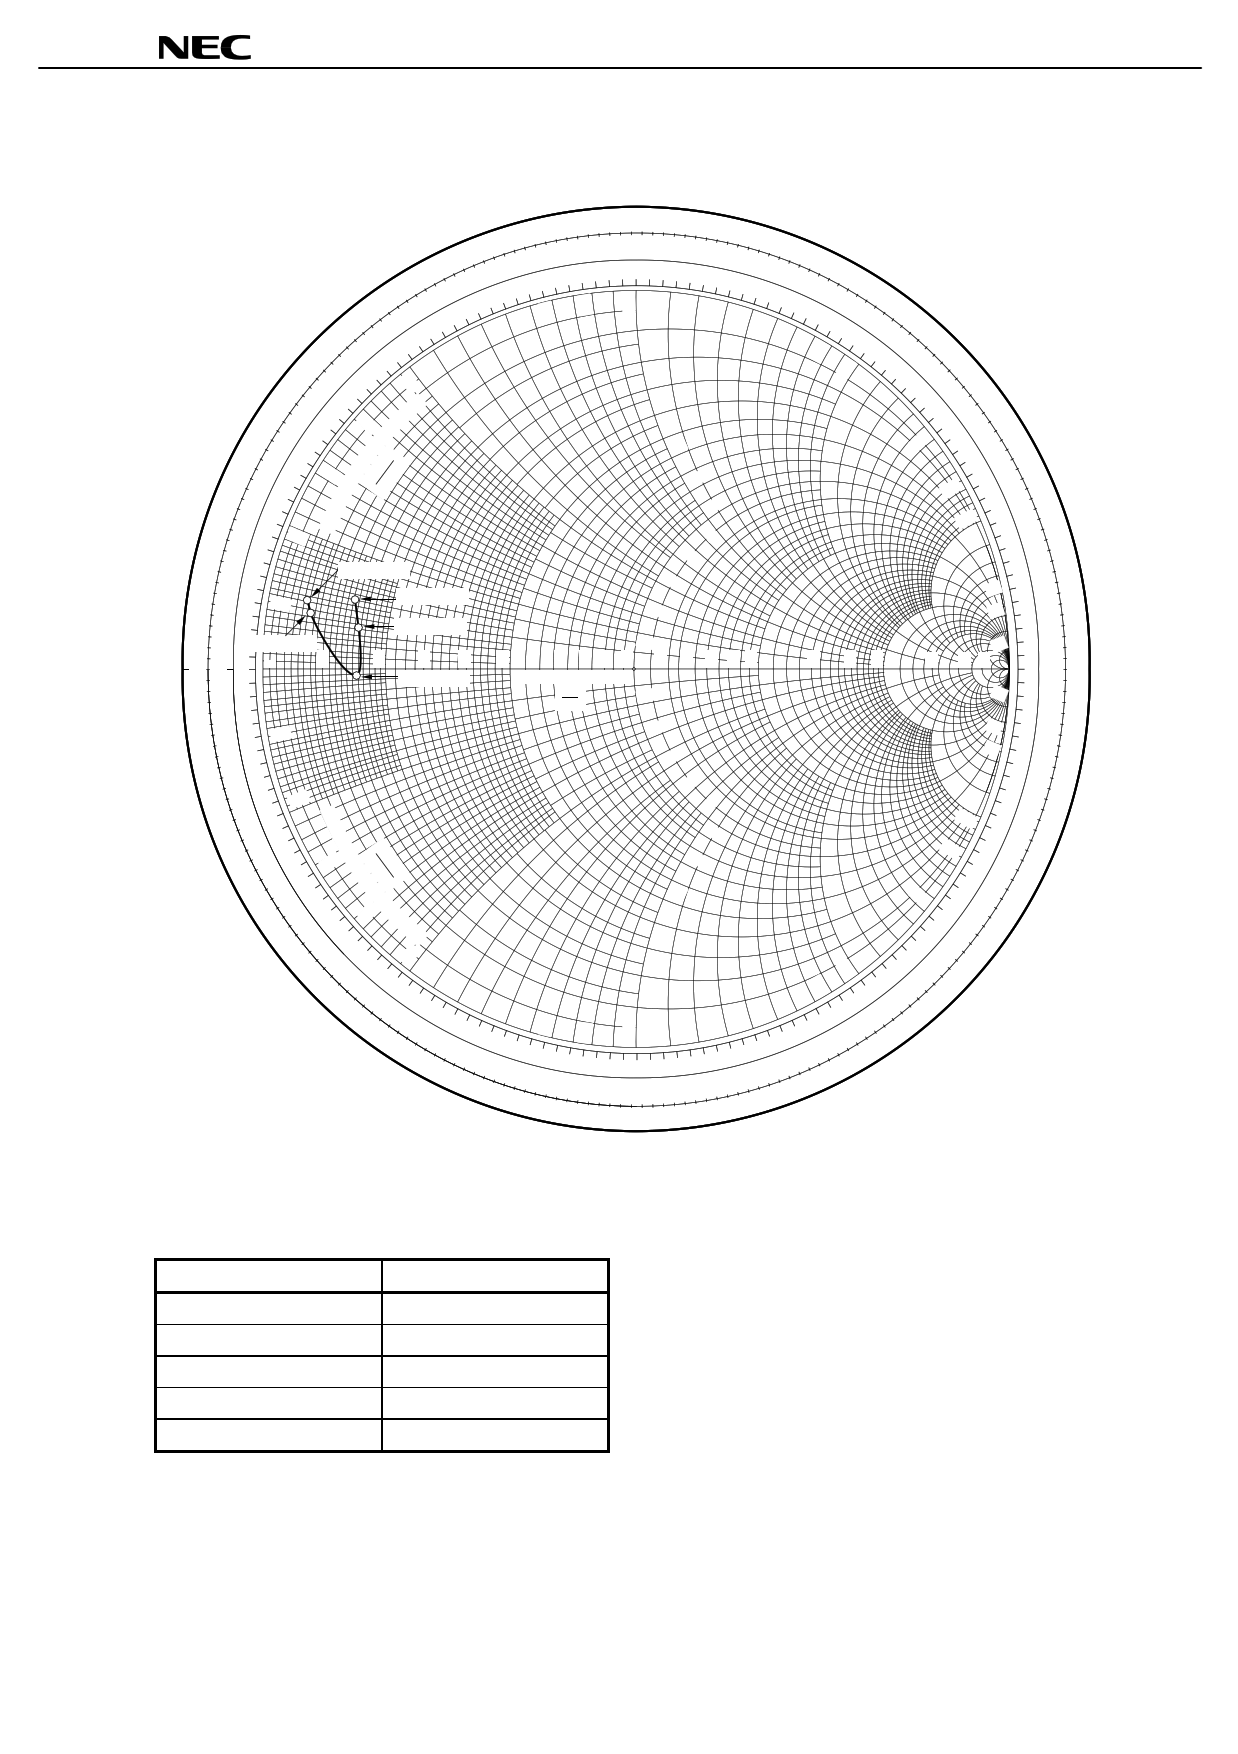 2SK2396A pdf, 반도체, 판매, 대치품